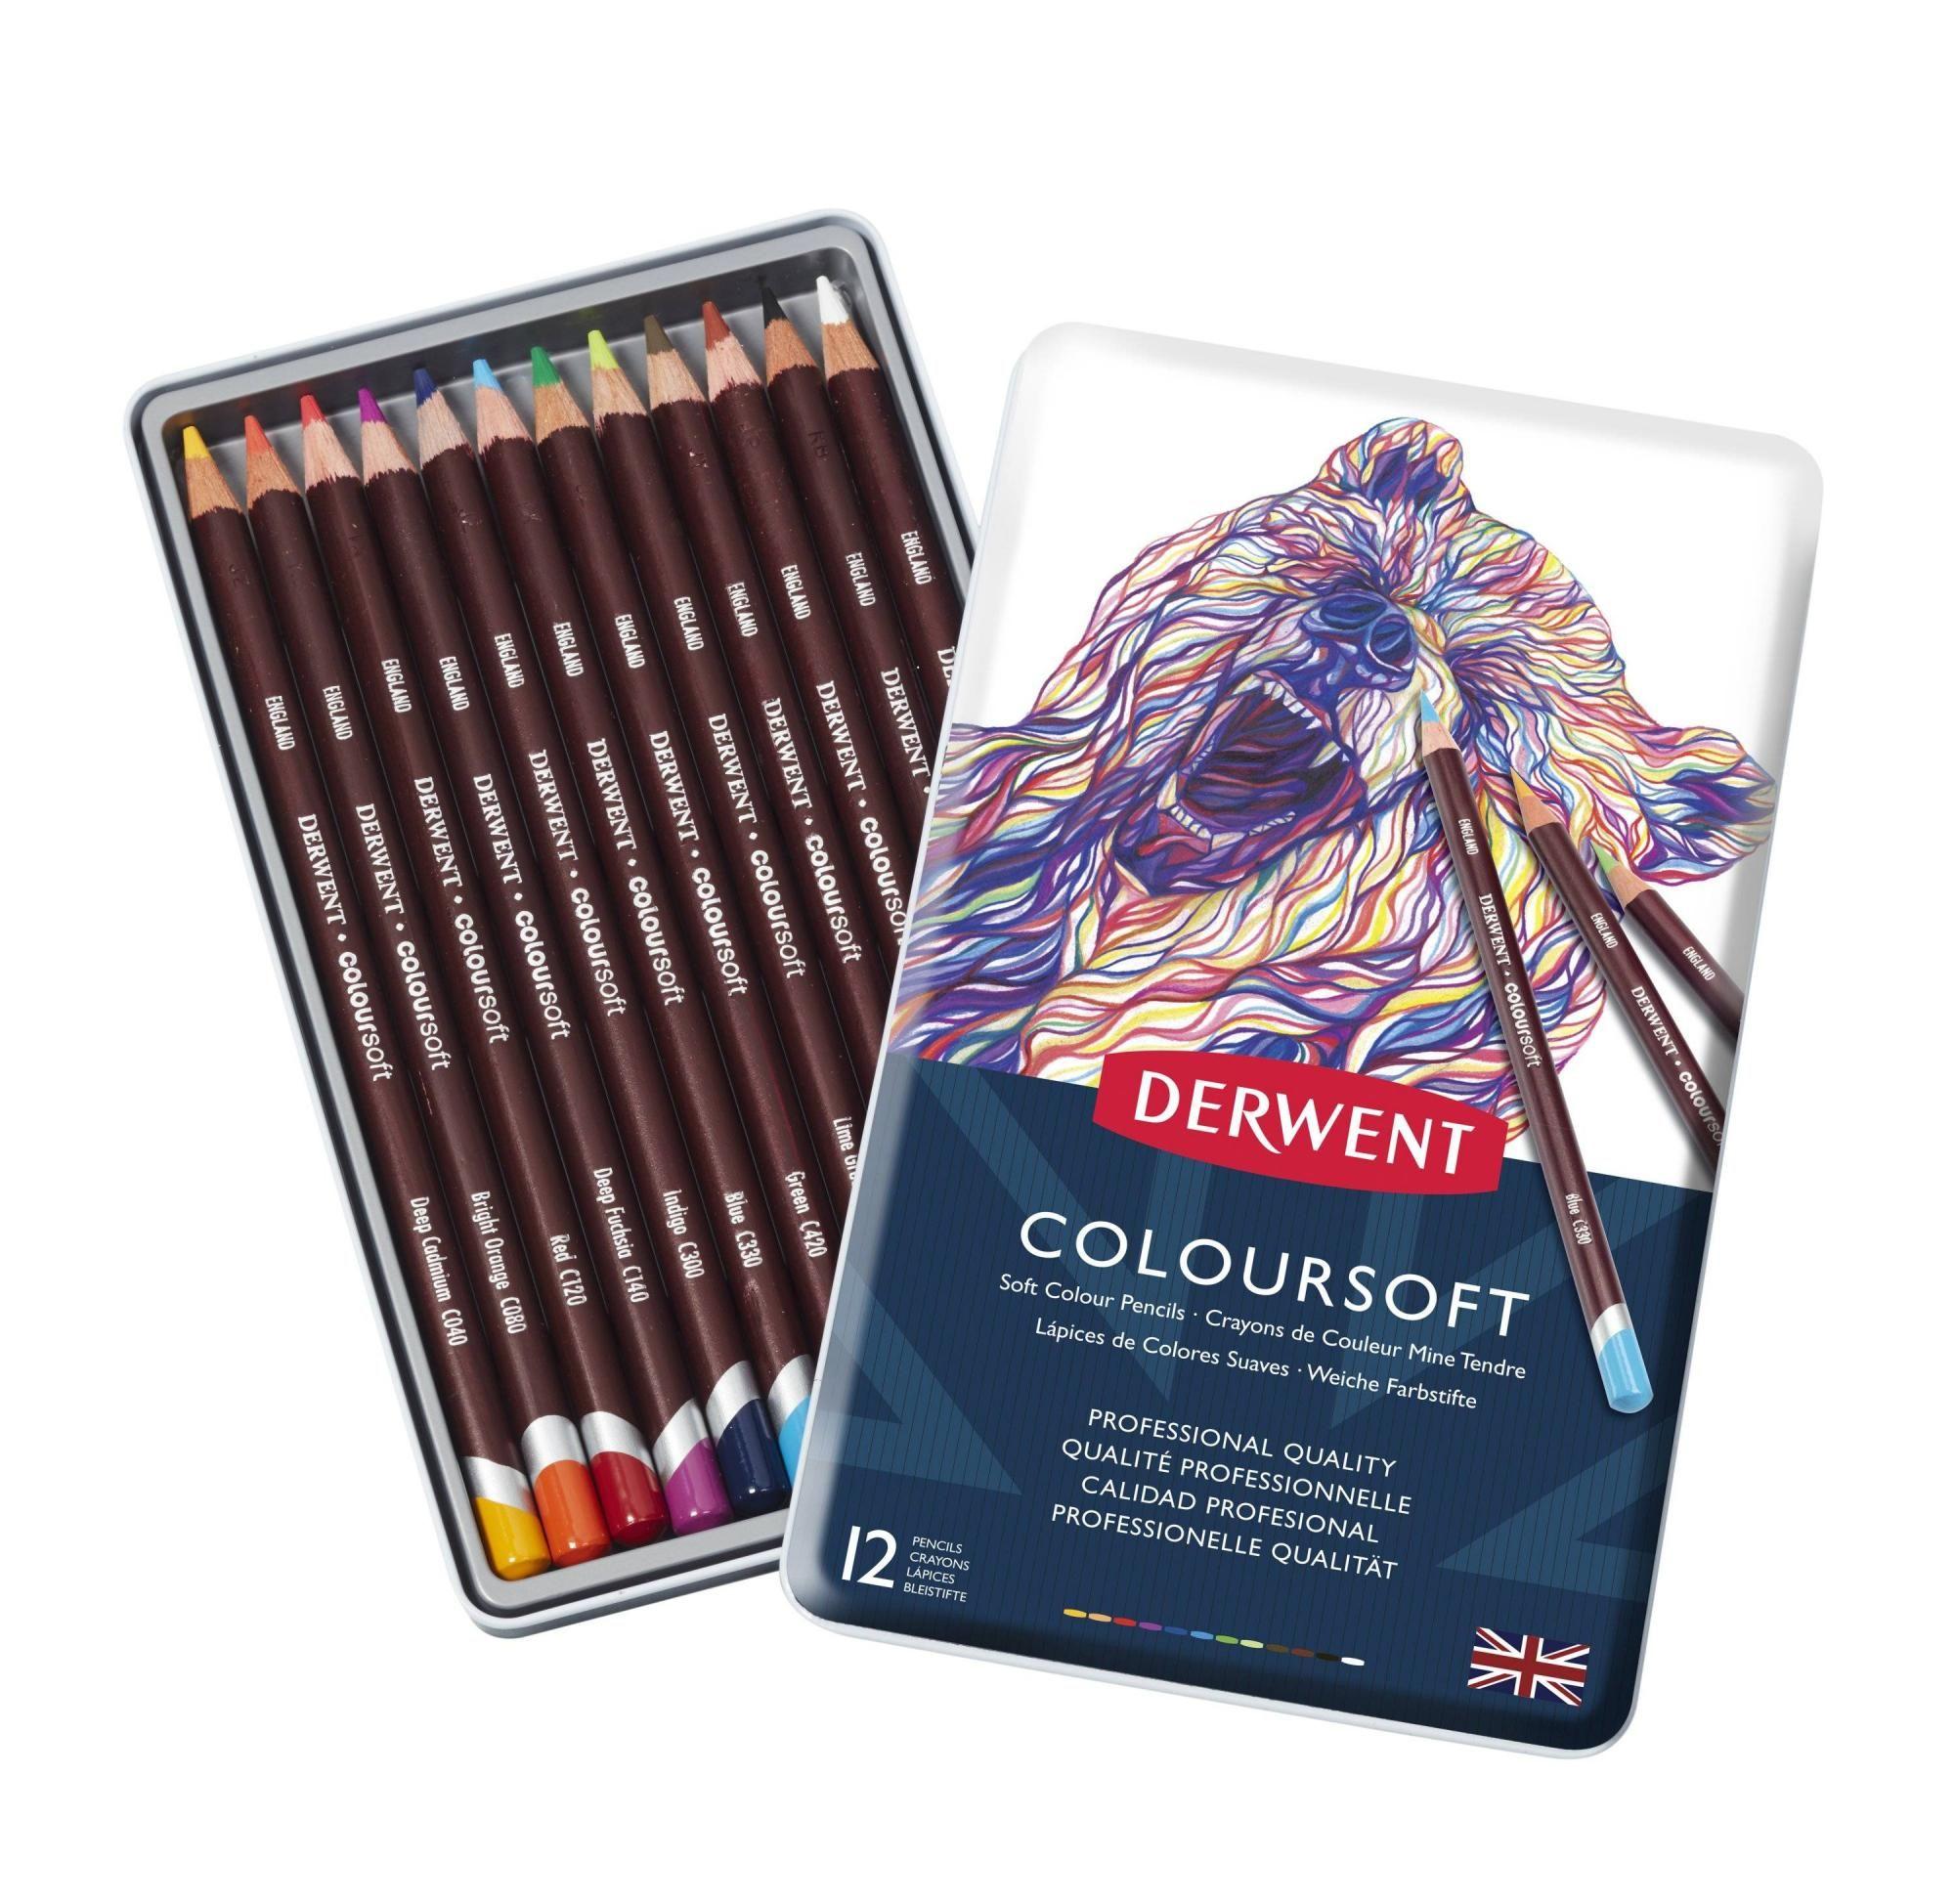 Derwent - Coloursoft Pencils, 12 Tin